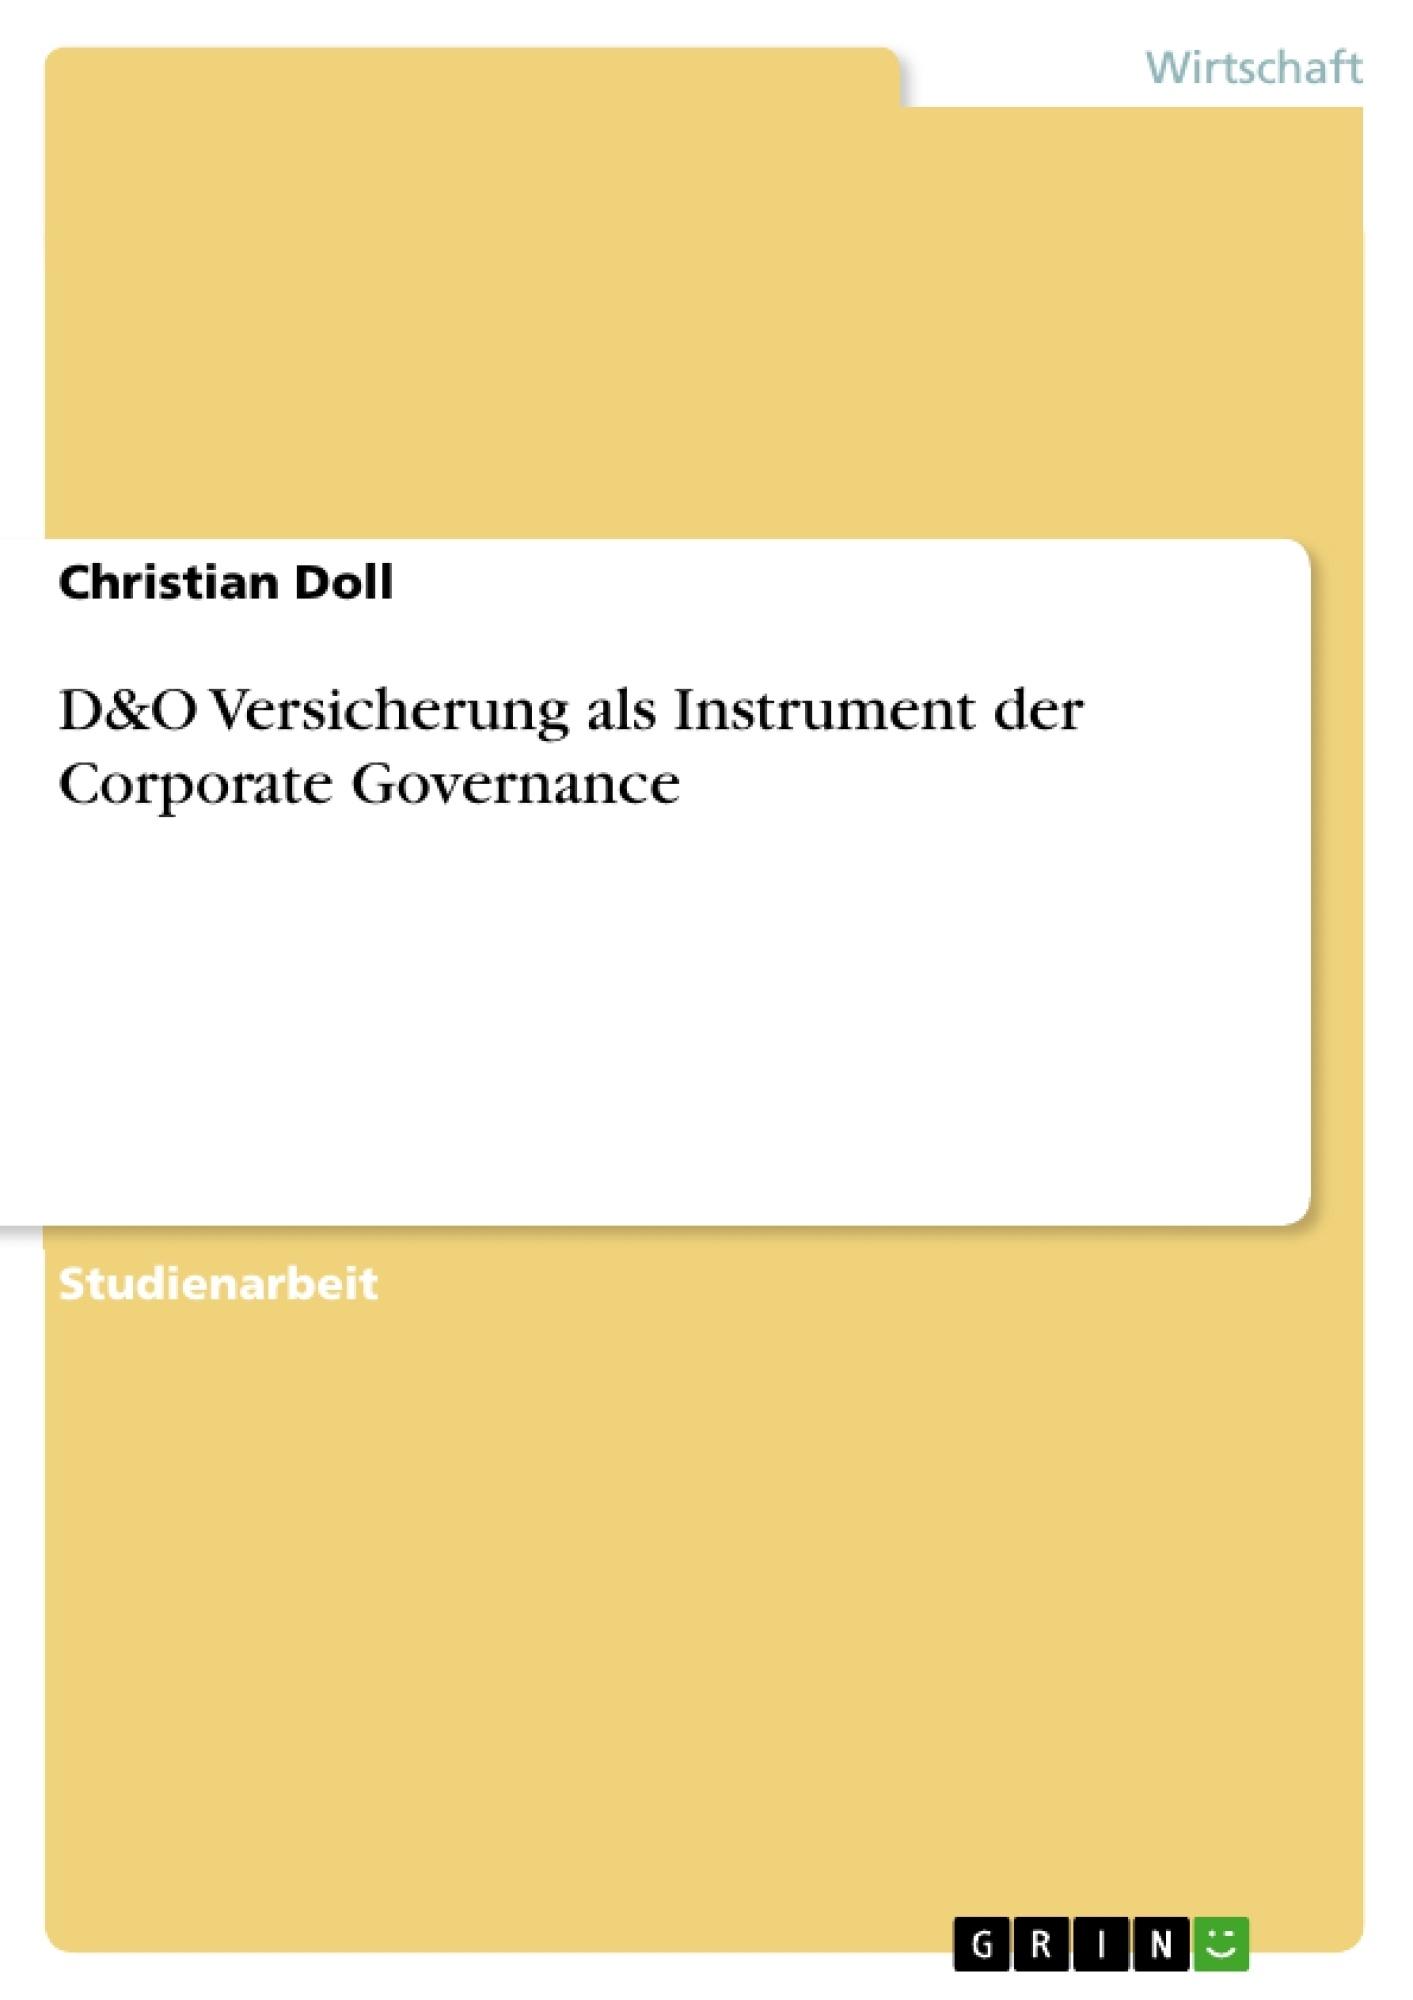 Titel: D&O Versicherung als Instrument der Corporate Governance